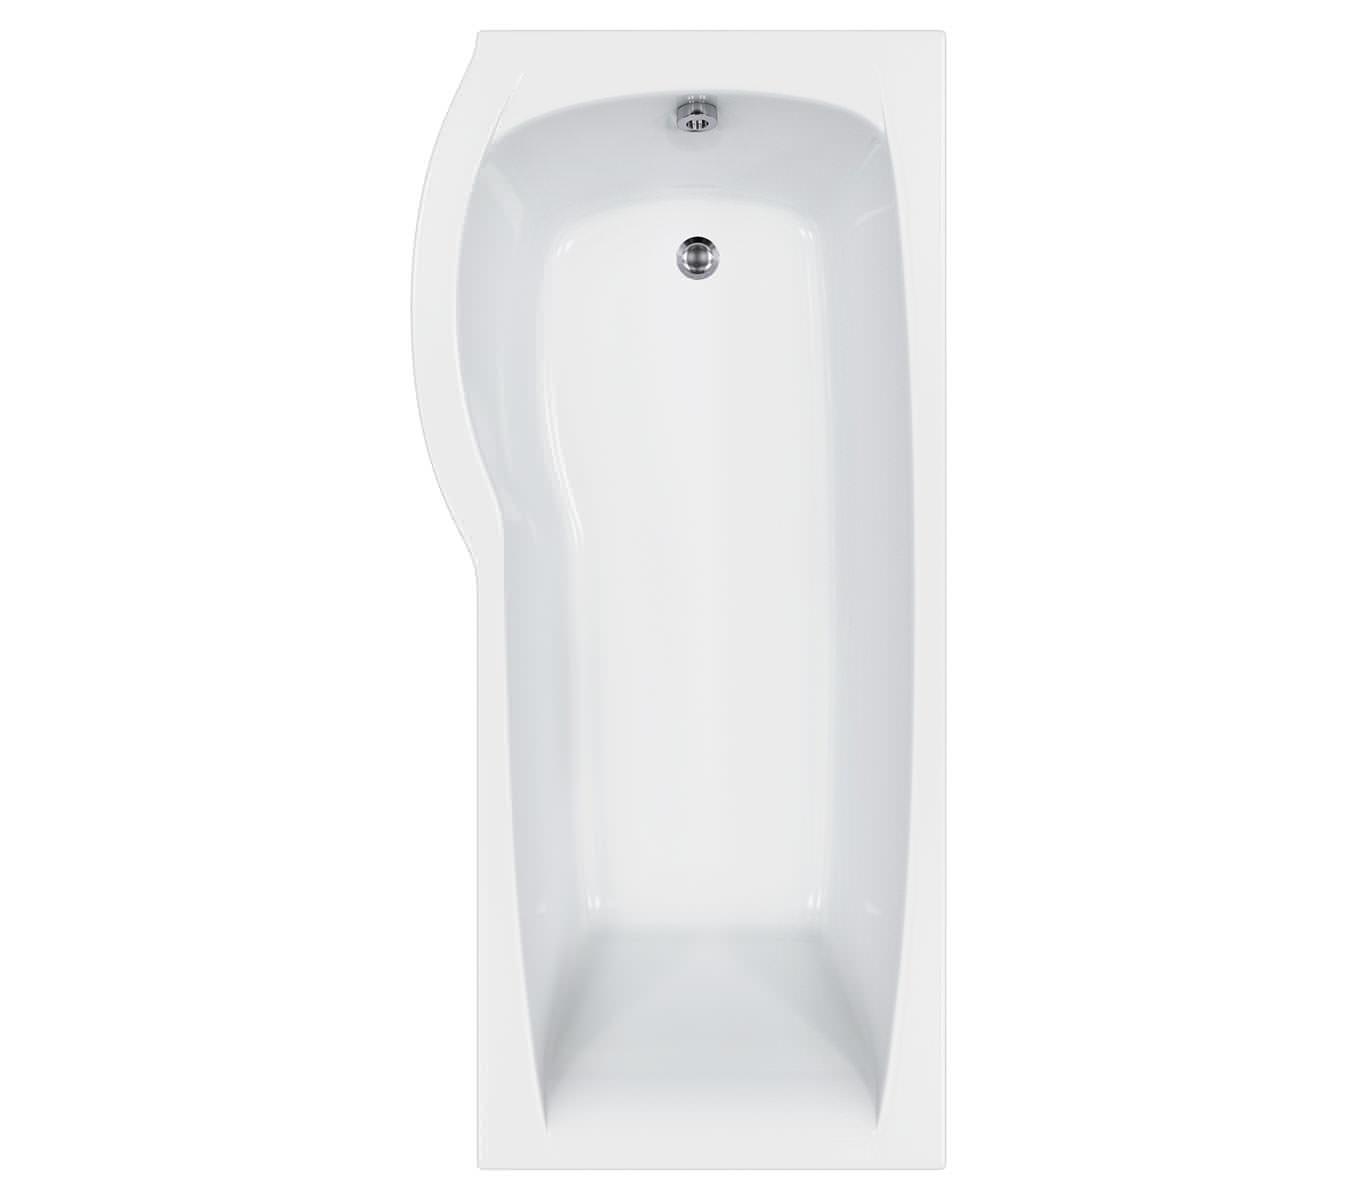 carron delta shower bath 1700 x 800mm cabdesb175palh carron delta 1700mm showerbath 5mm acrylic one stop